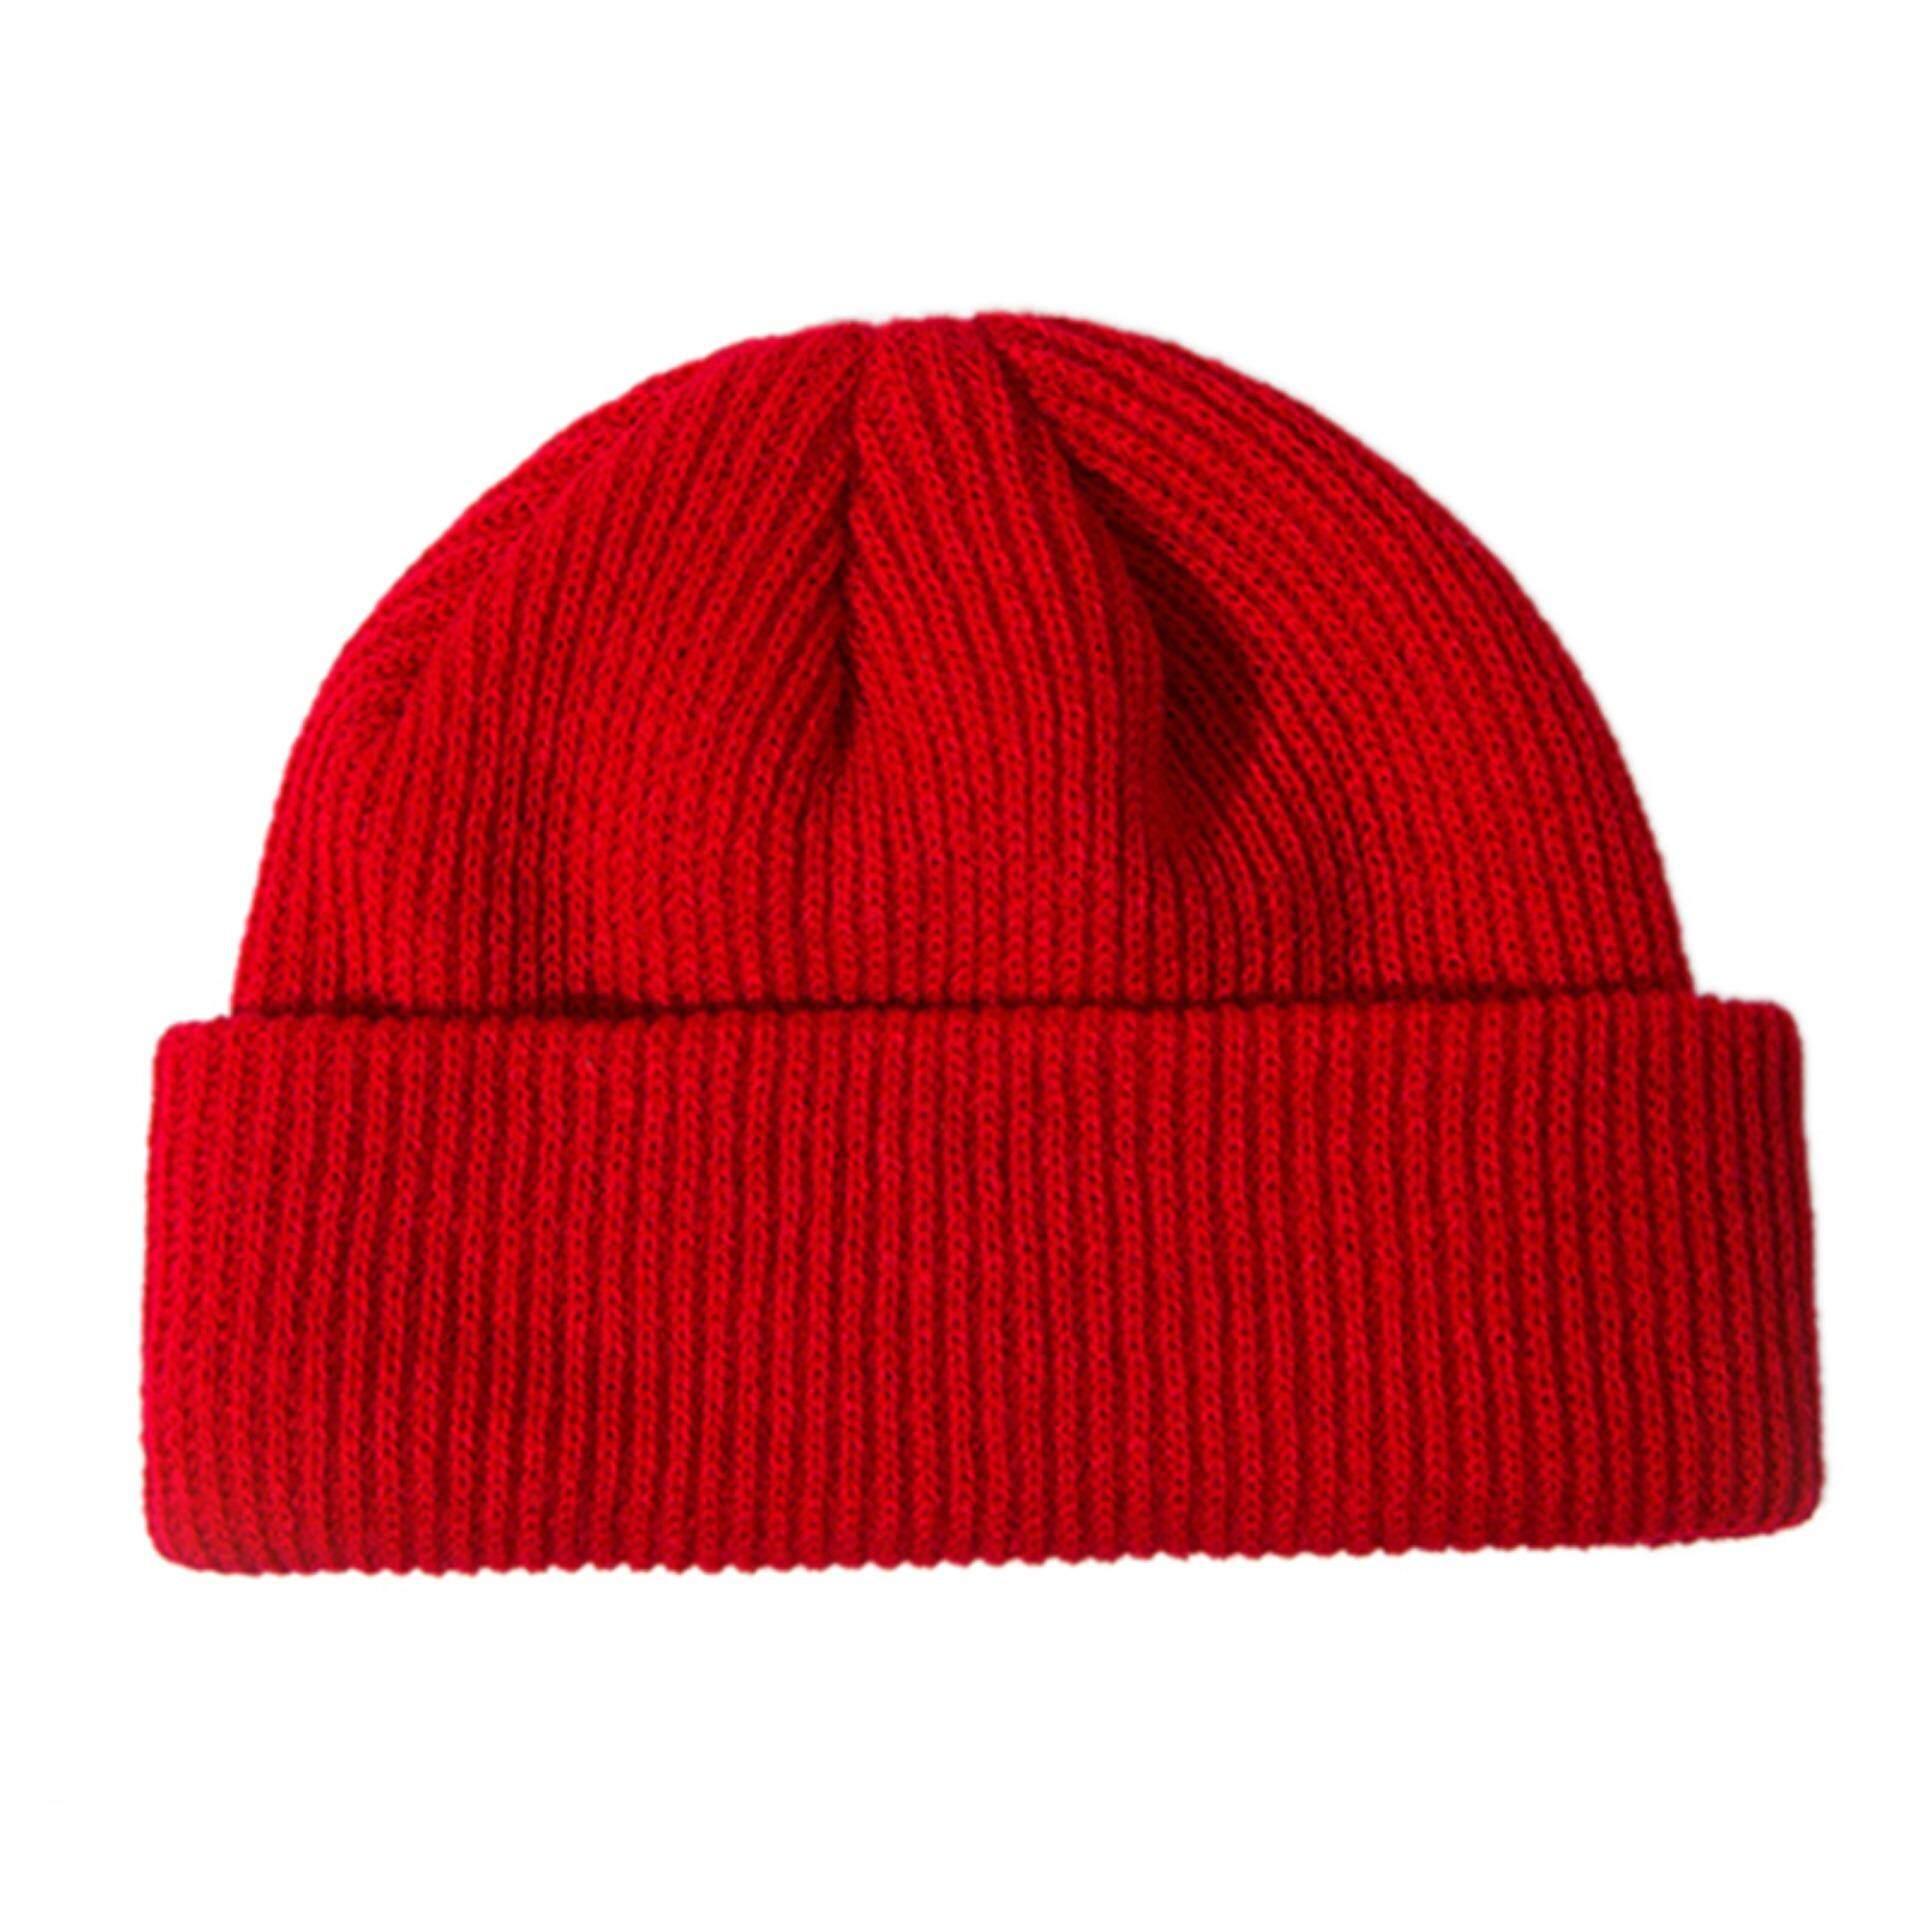 1233d941d564 Unisex Men Women Beanie Hat Warm Ribbed Winter Turn Ski Fisherman Hat  Fashion Variety